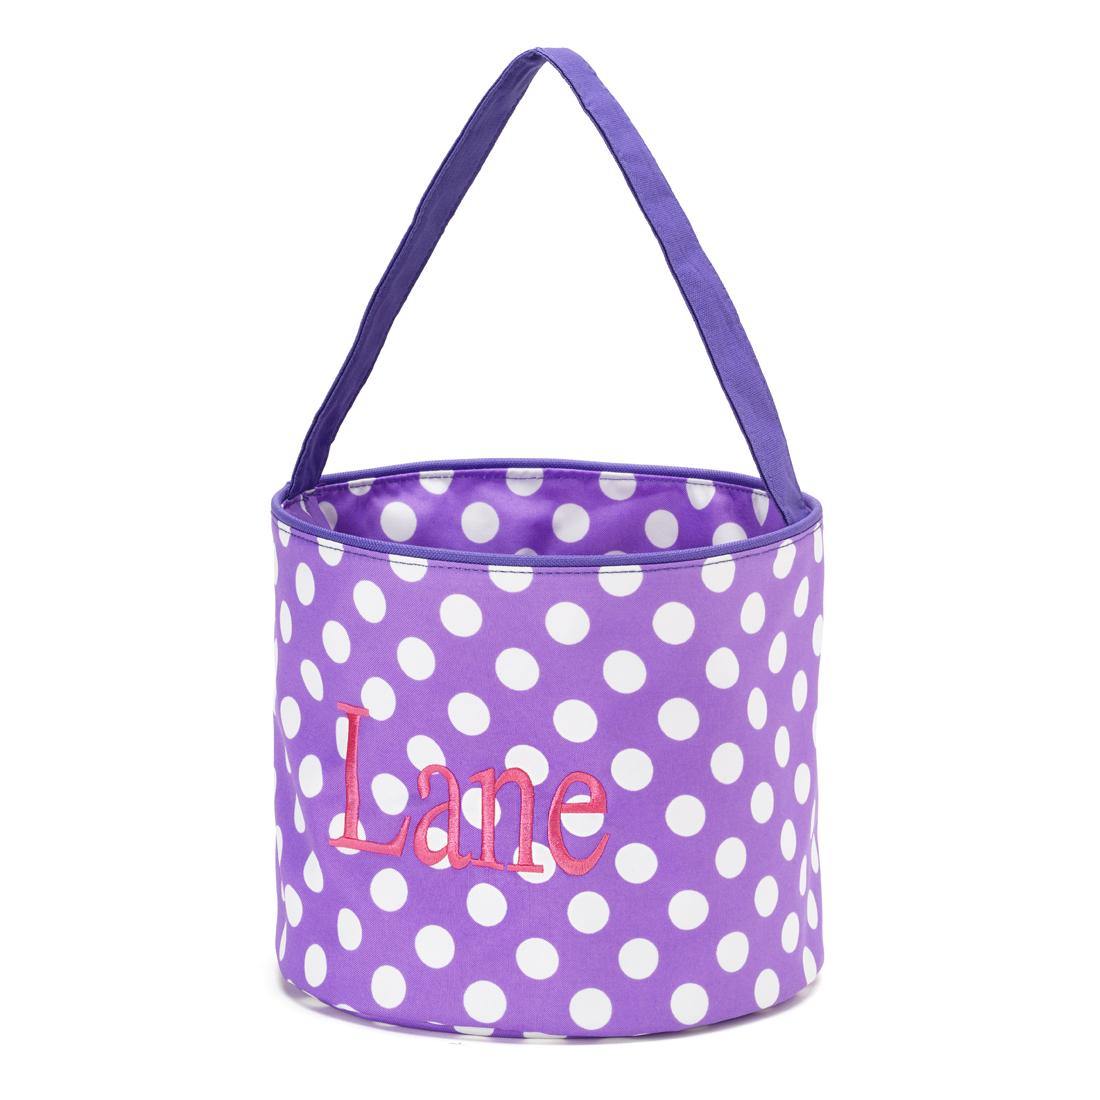 Polka Dot Bucket - Purple and White